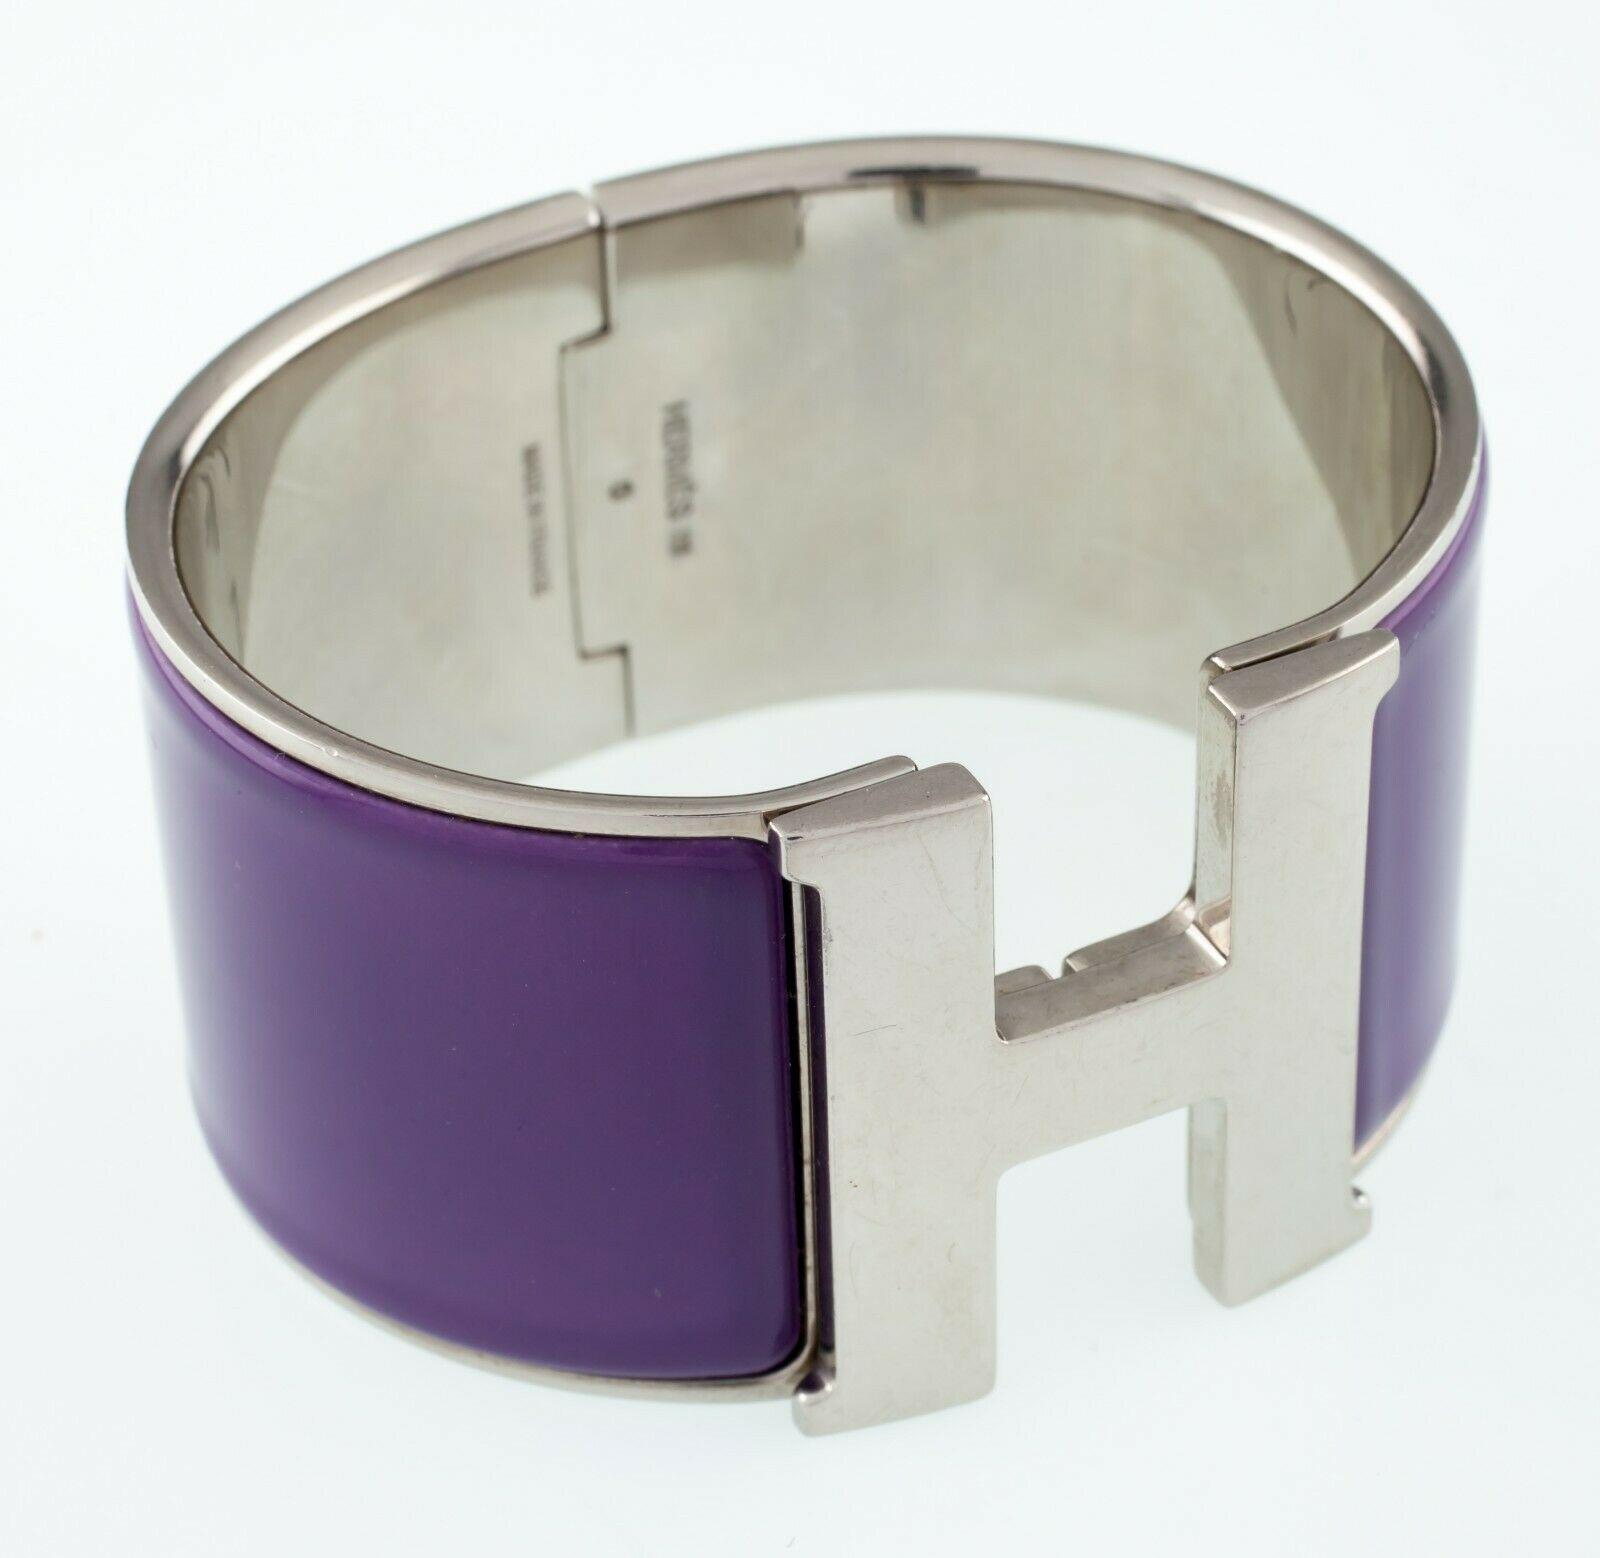 Hermès Clic Clac Violeta Extra Ancho Pulsera Nice!